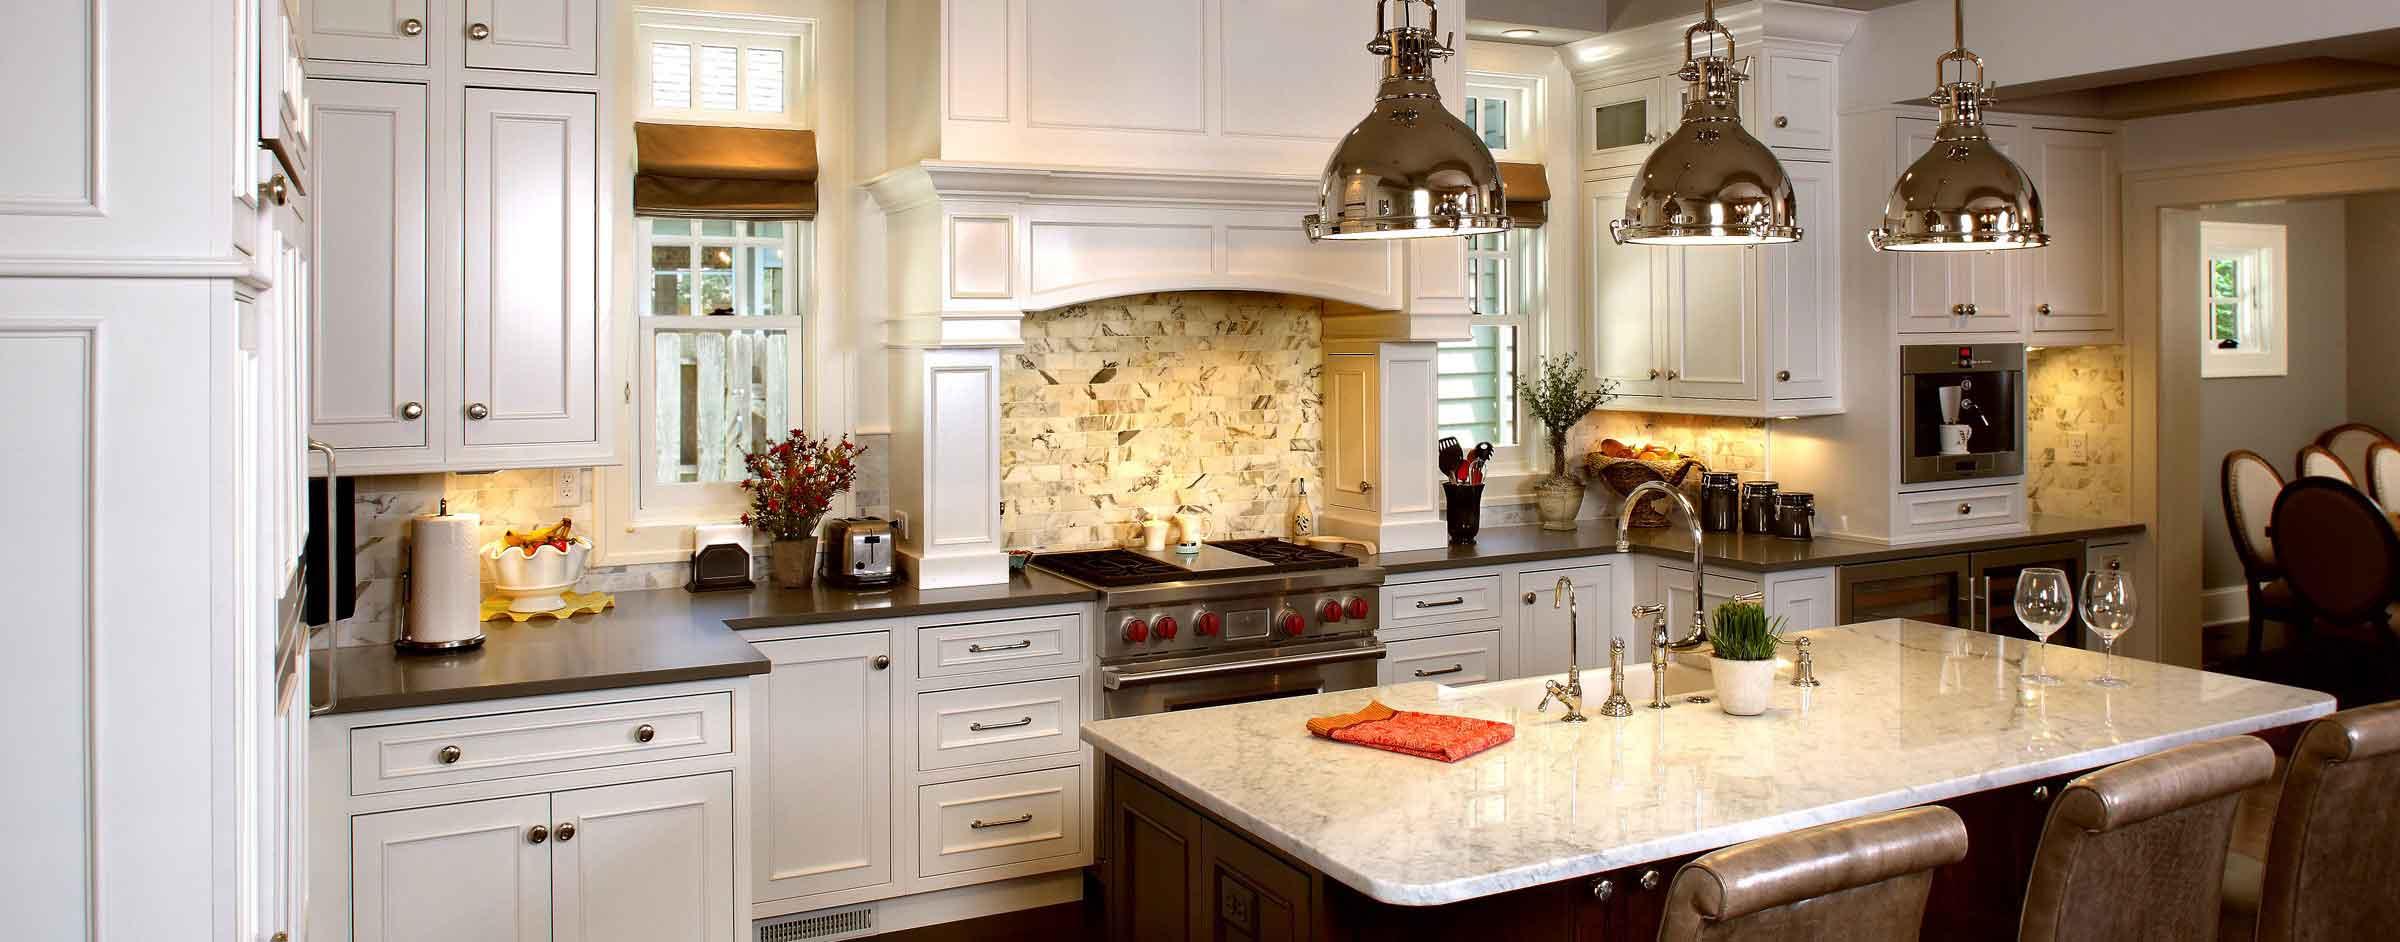 Dise ador profesional de cocinas en madrid for Disenador de cocinas integrales